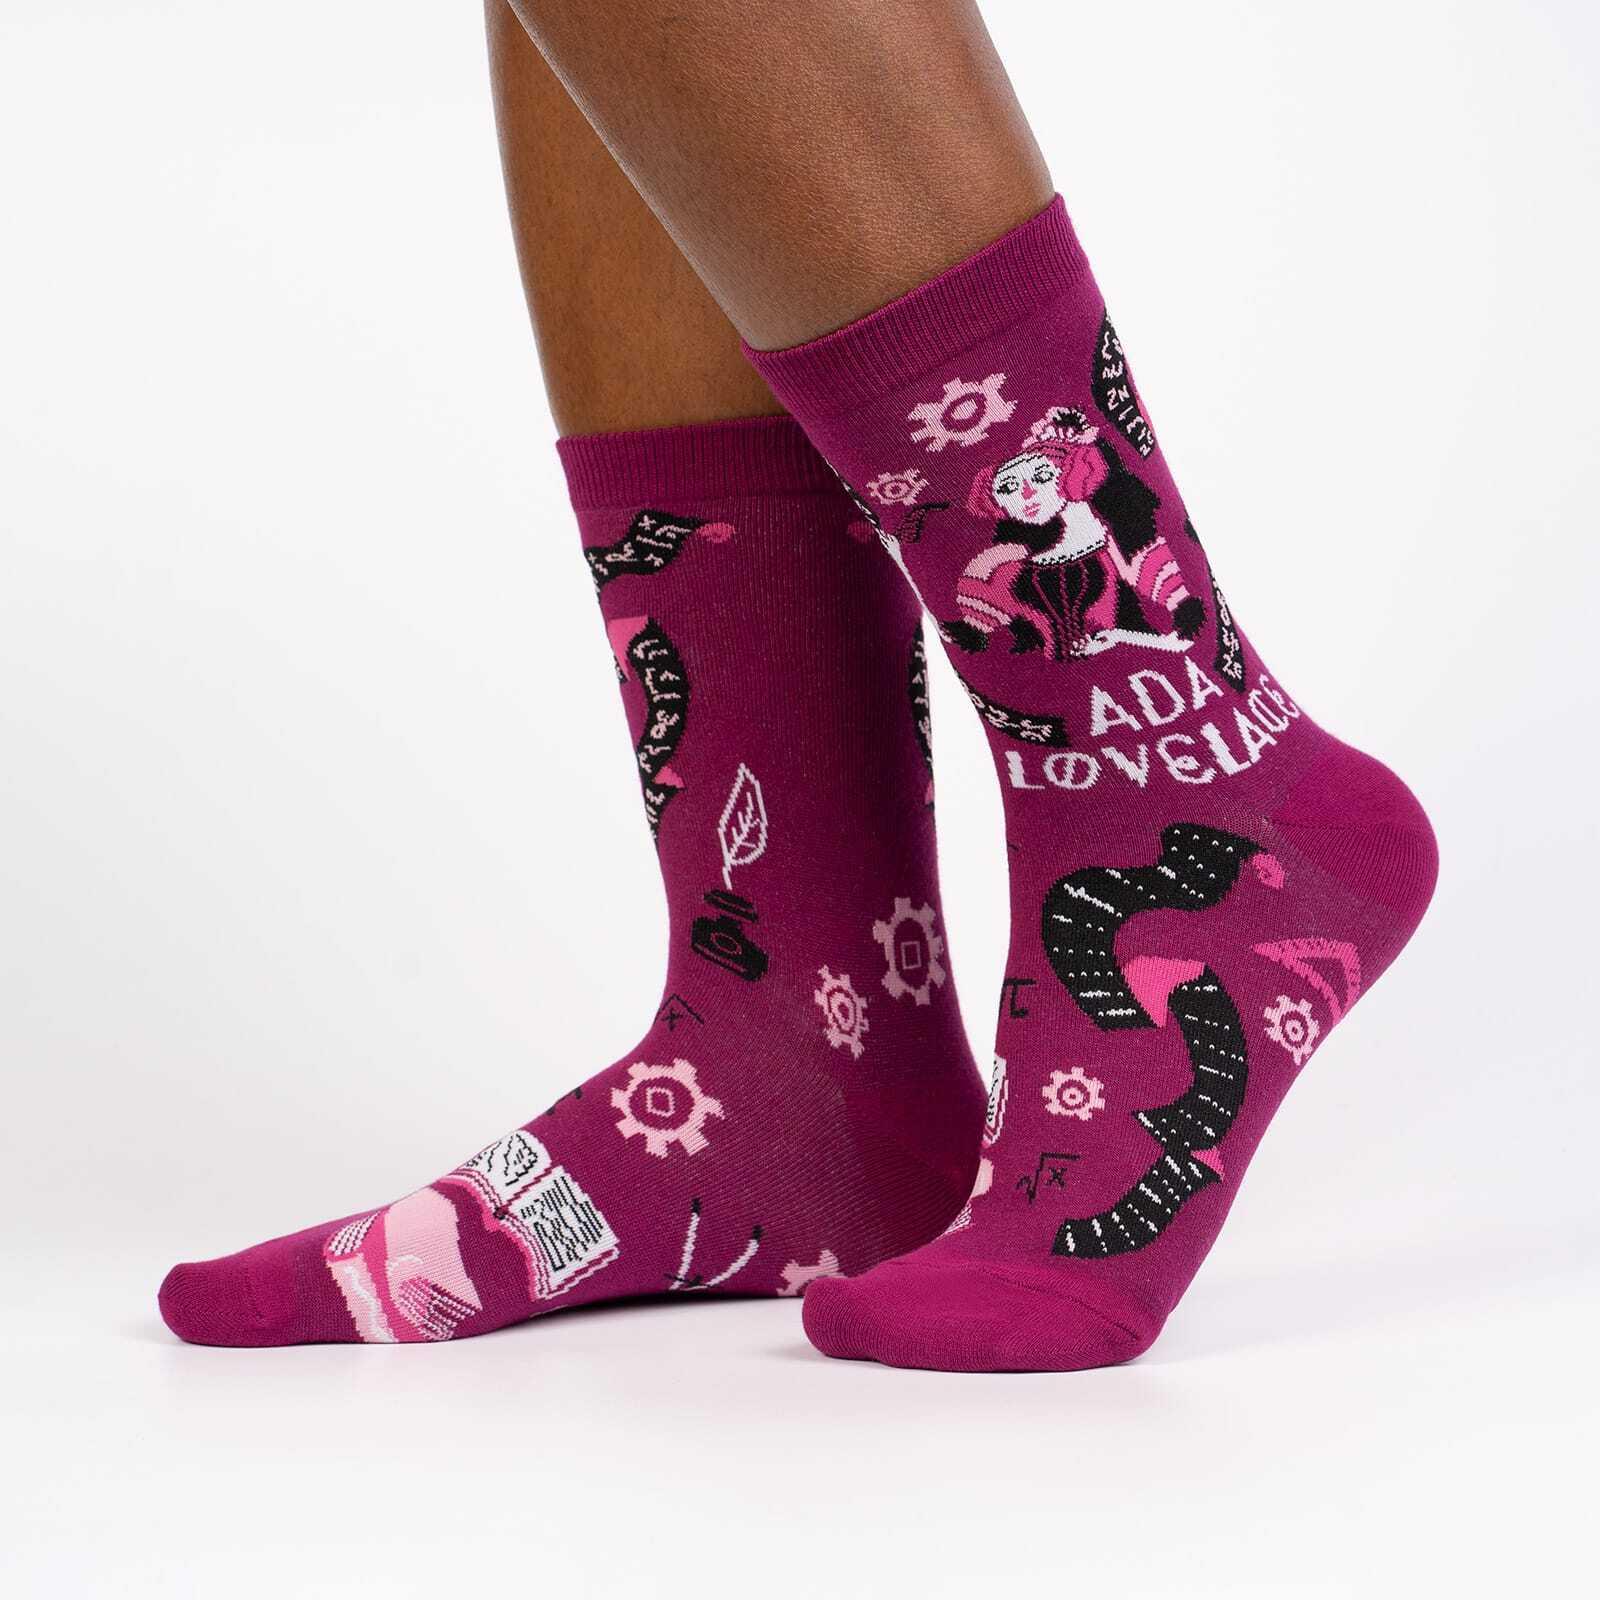 model side view of Ada Lovelace - Famous Science Feminist Icons Crew Socks Maroon - Women's